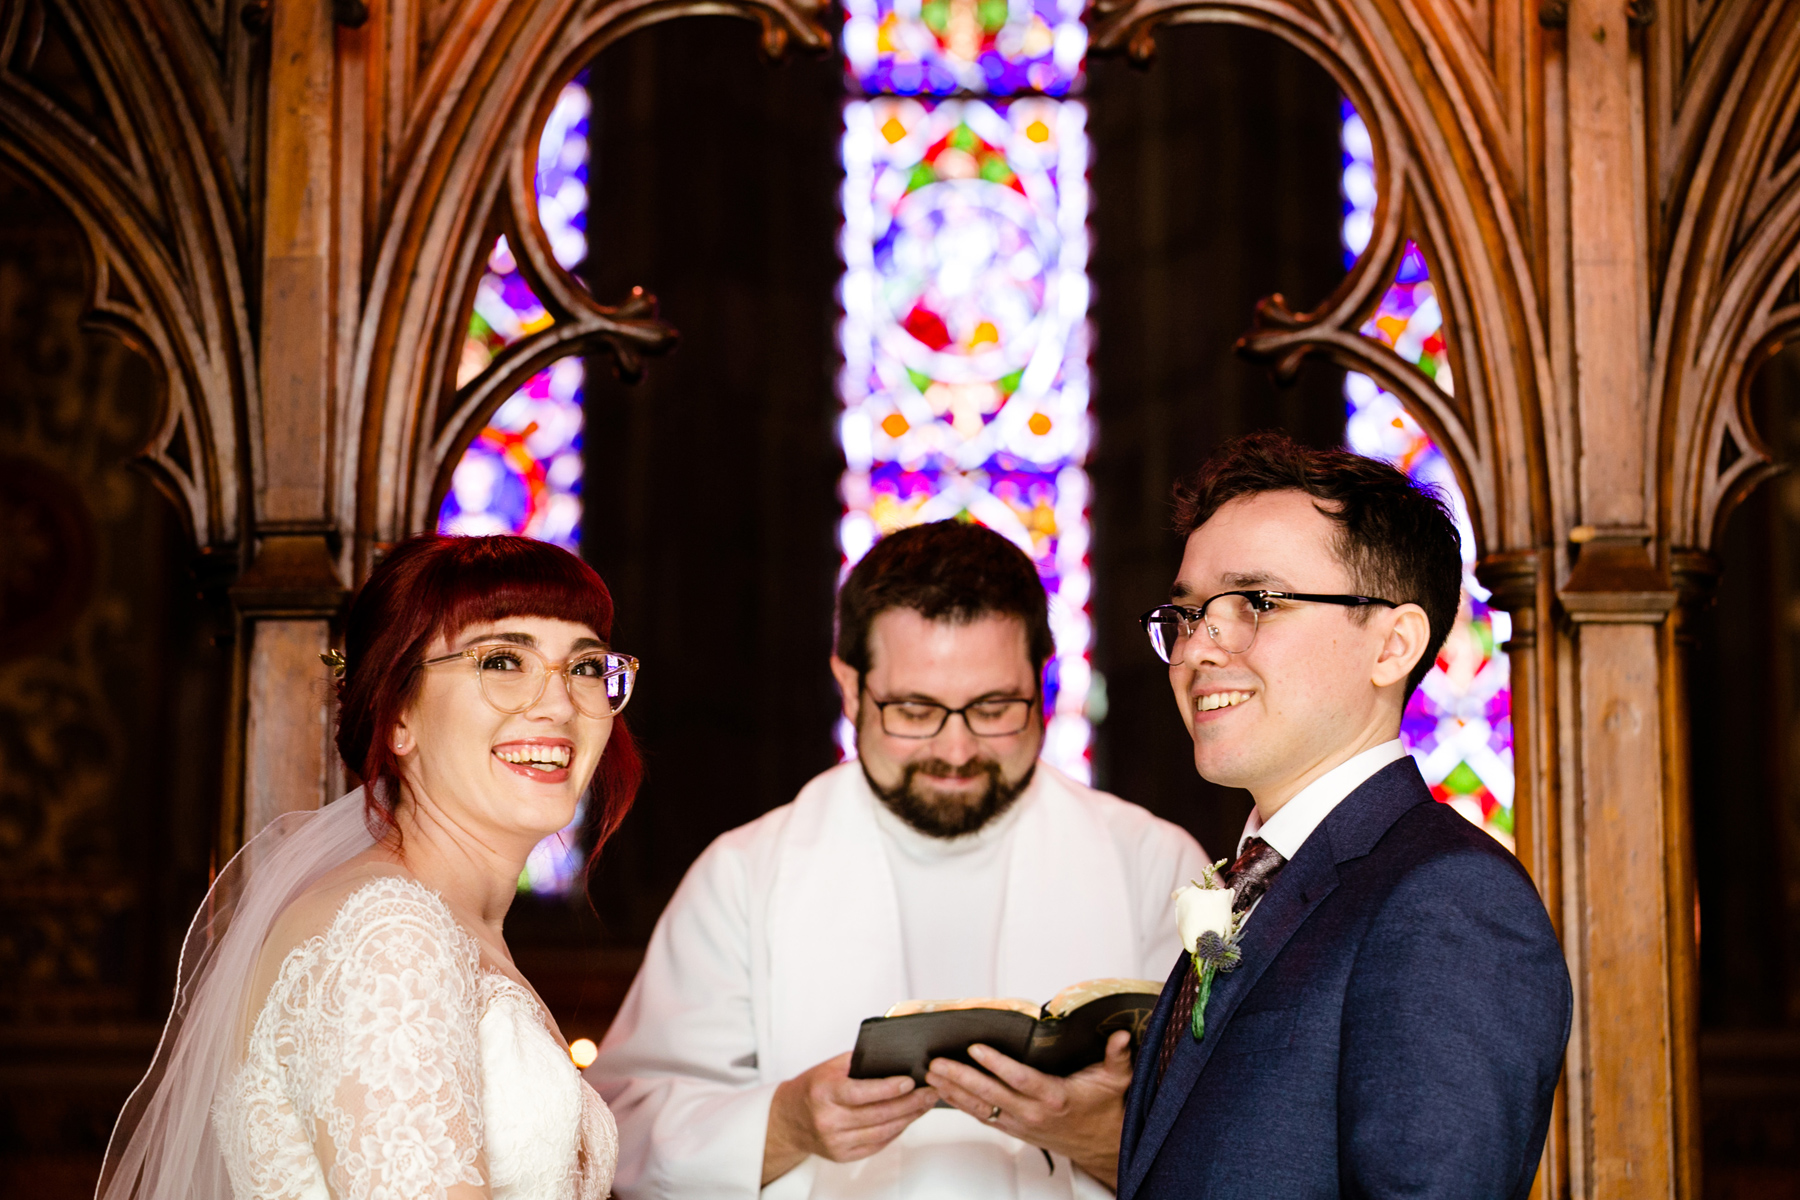 023-fredericton-wedding-photographer-kandisebrown-em2017